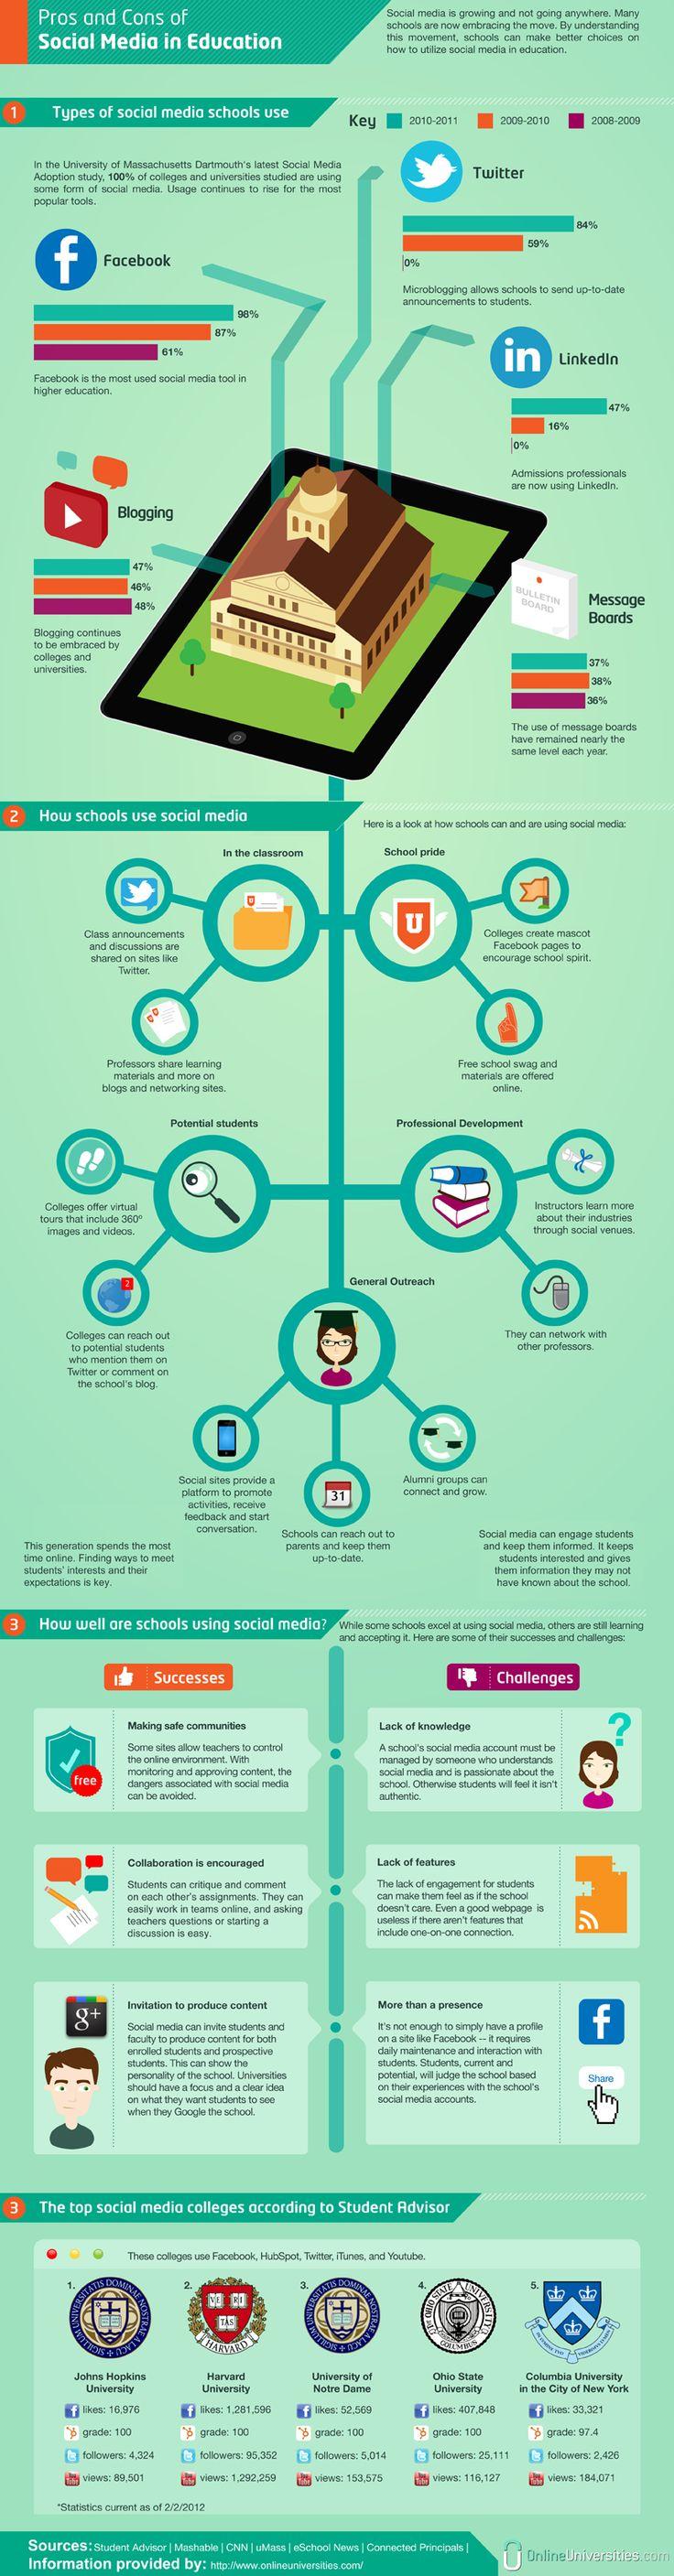 The pros and cons of social media in #education | Social media in het #onderwijs